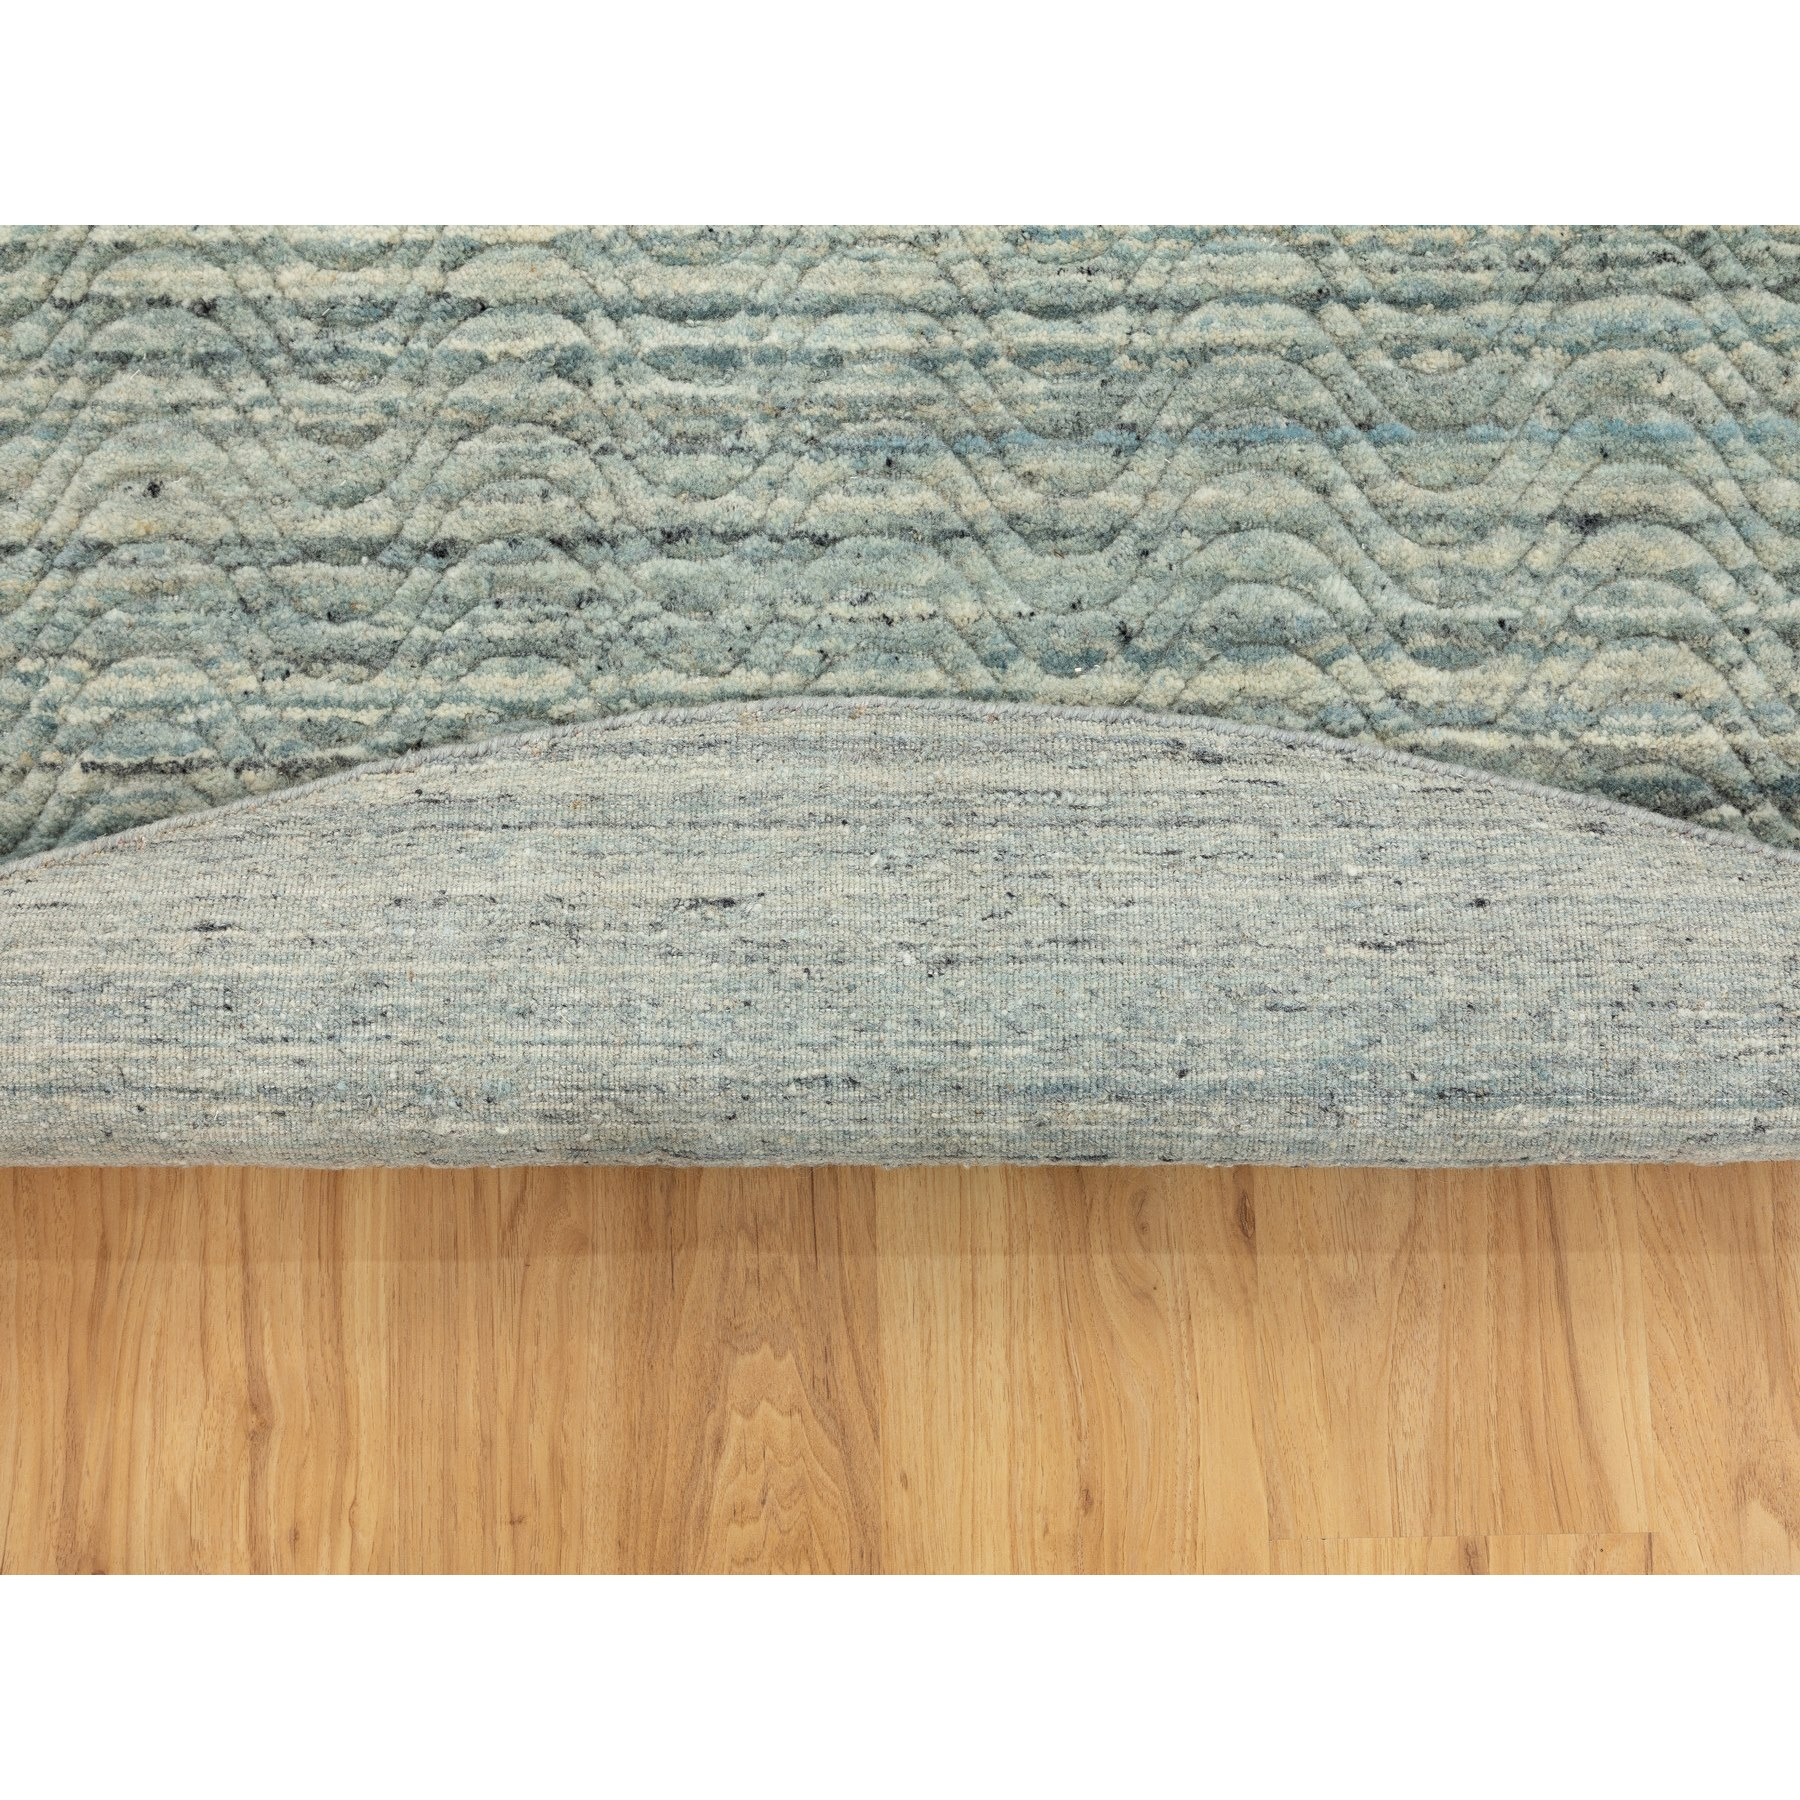 "7'8""x7'8"" Green Hand Loomed Variegated Design Textured Wool Modern Round Rug"